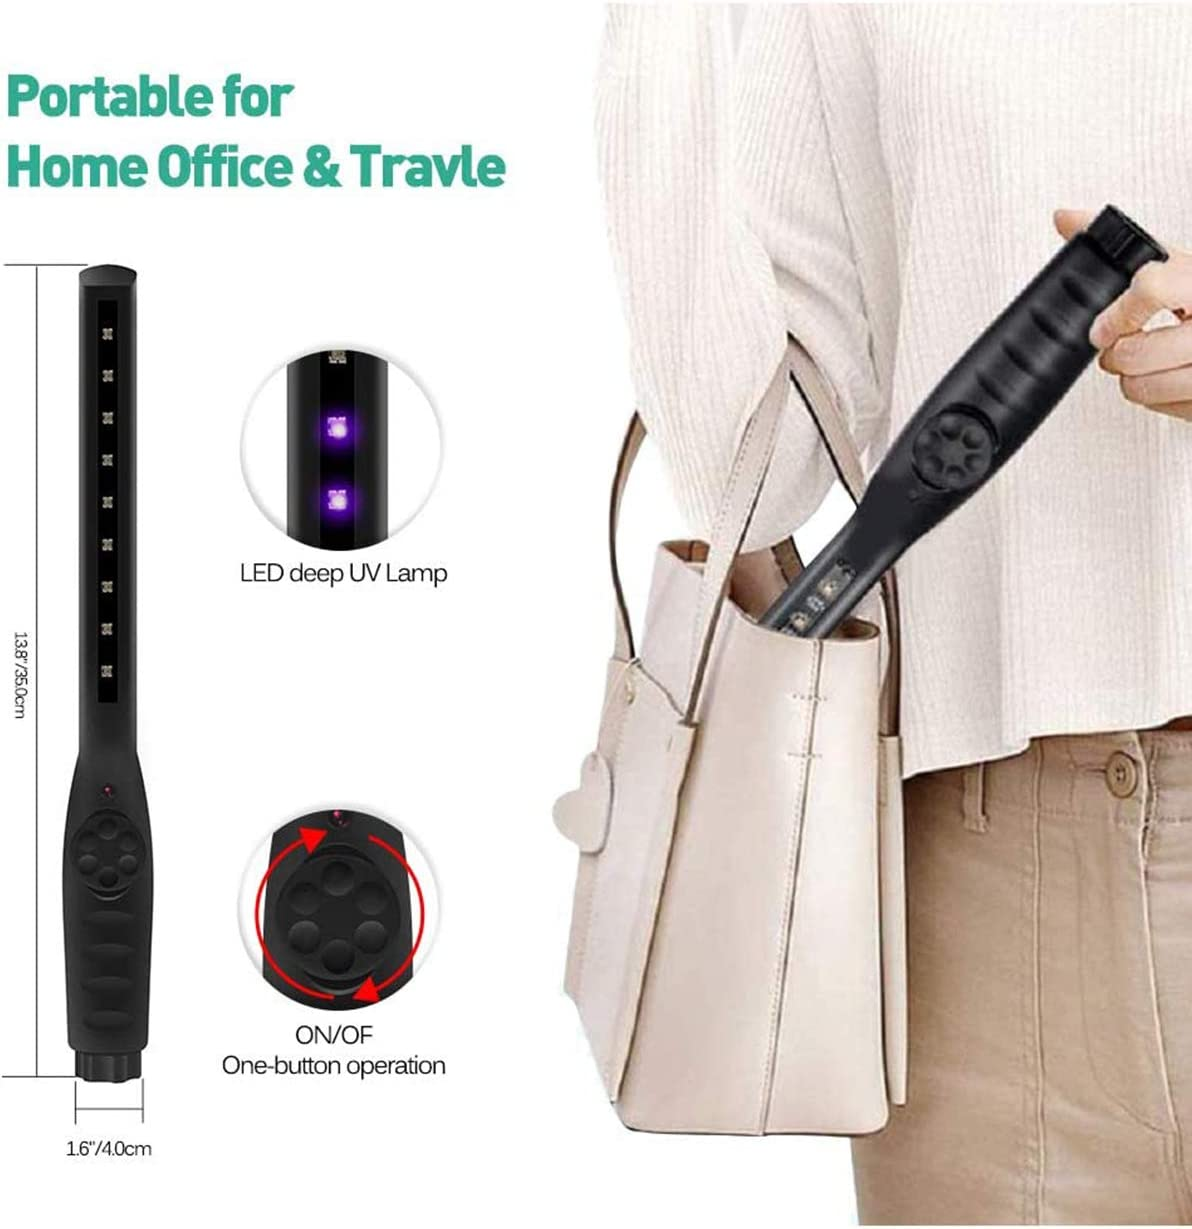 RL Portable Rechargeable UV Sterilizer Lamp for Germs Virus Disinfection Light Bulb UV Phone Sanitizer for Home Office Travel Sterilization Black